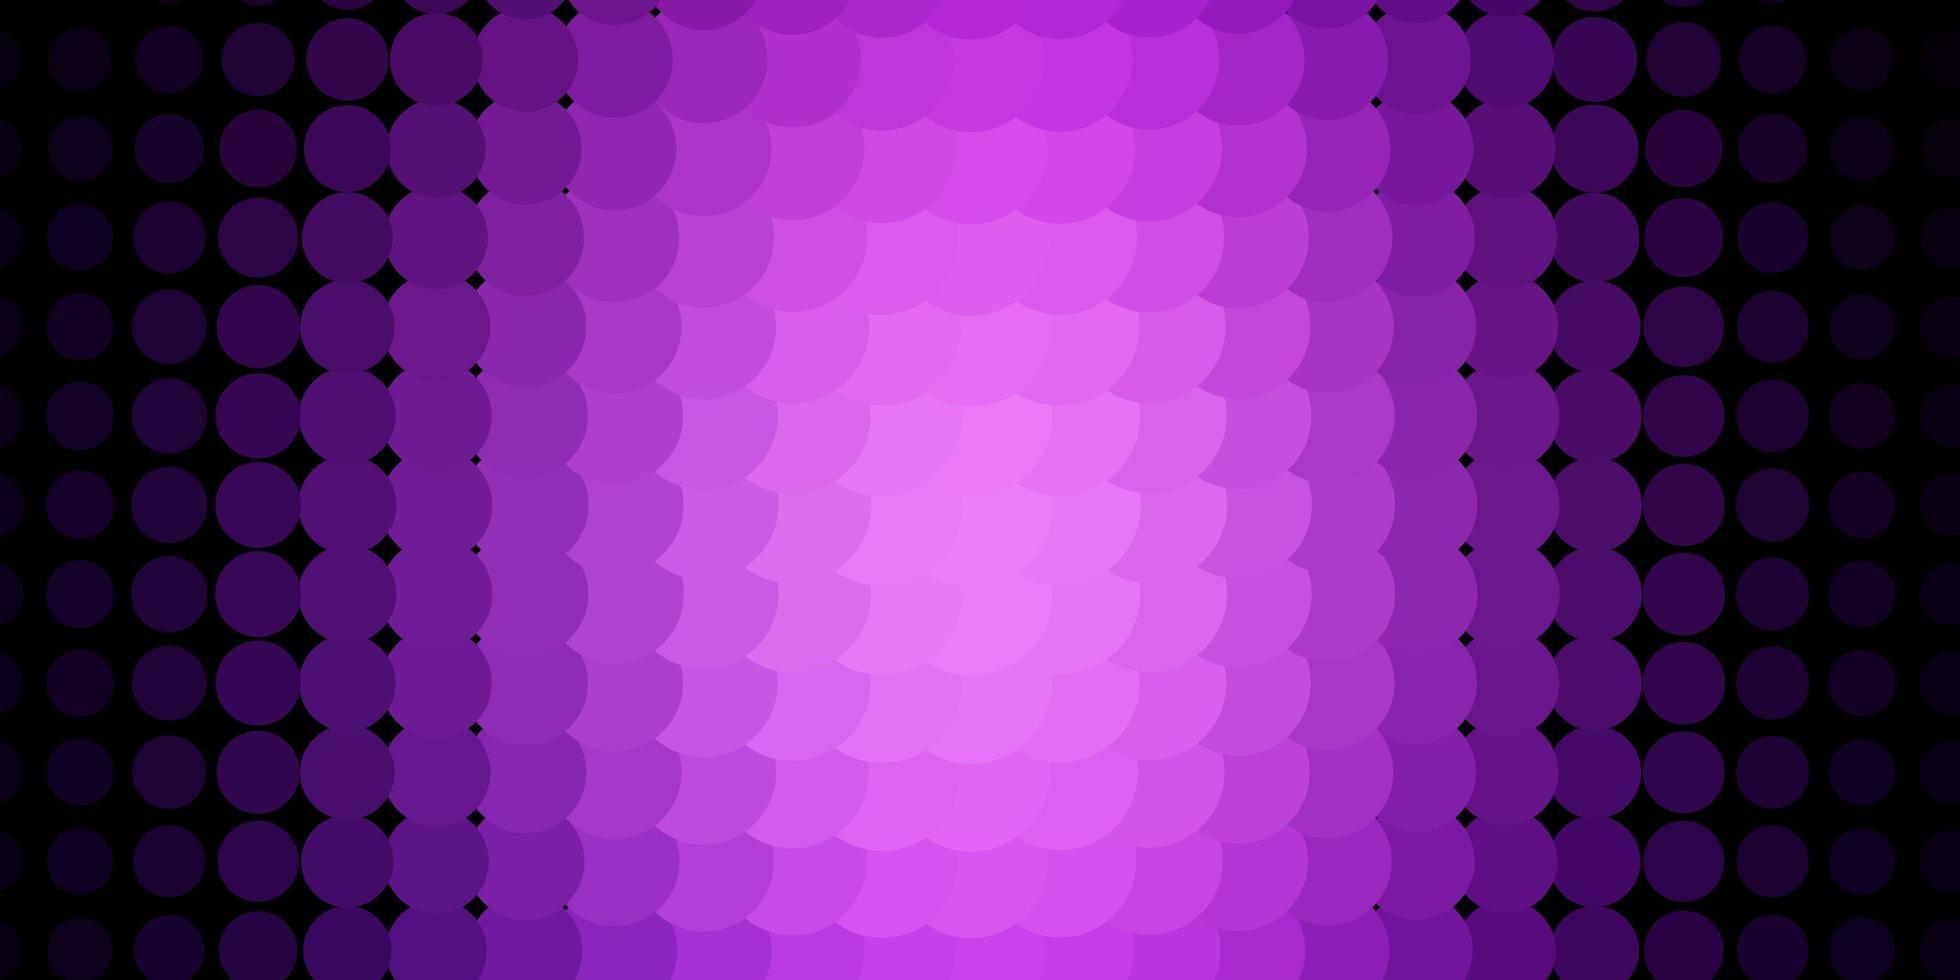 modelo de vetor roxo escuro com círculos.